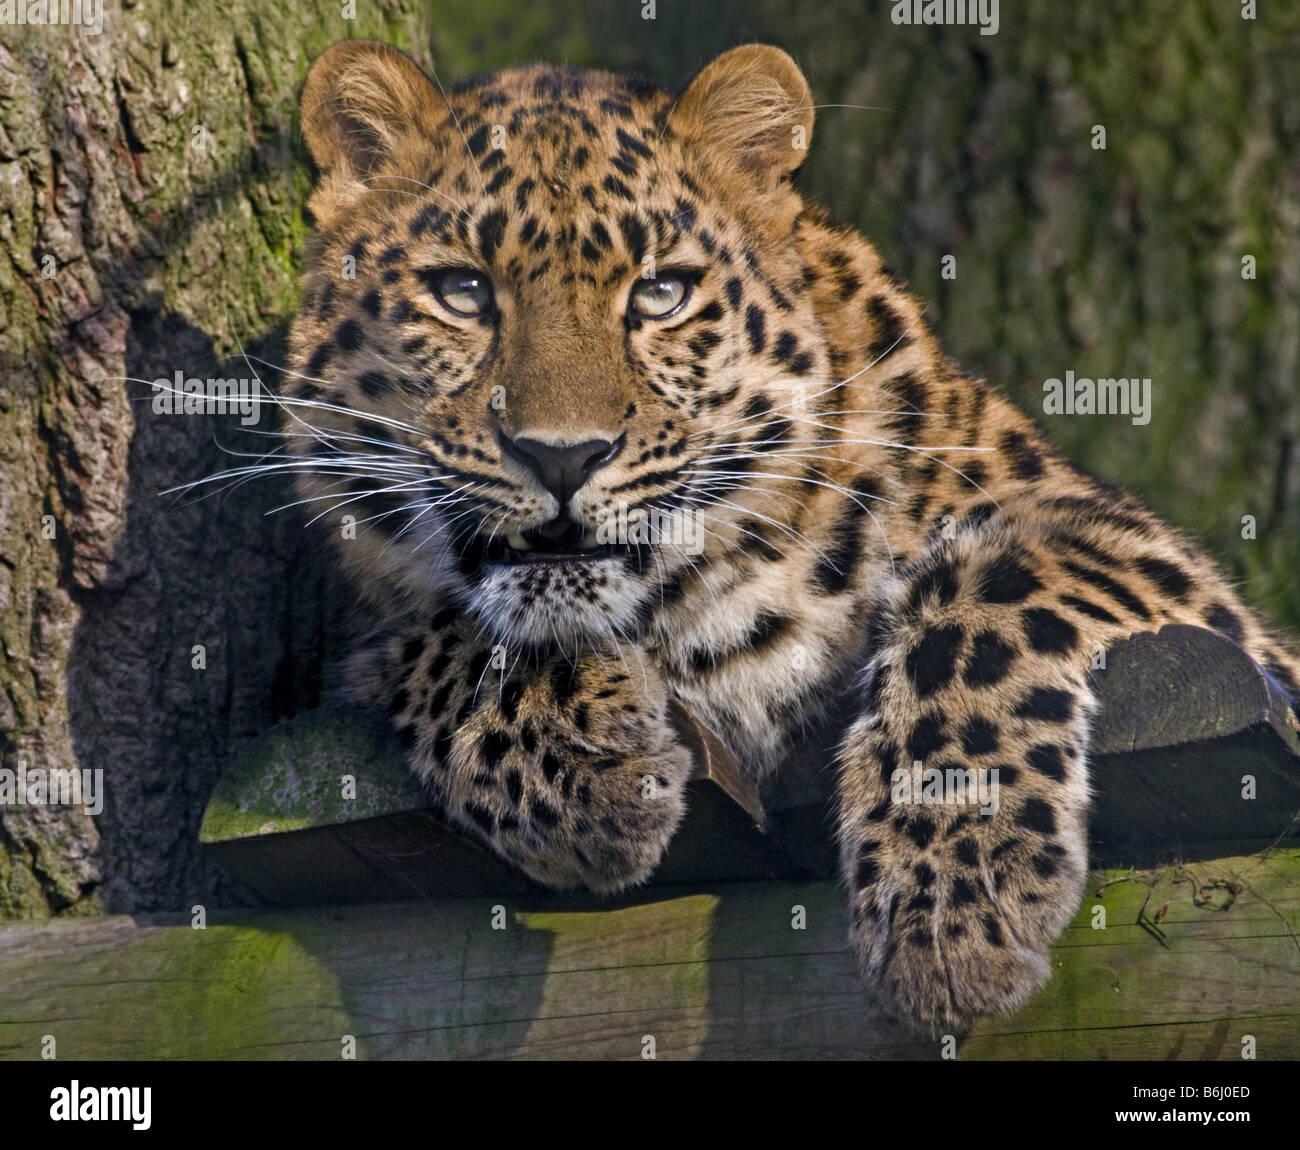 Juvenile Amur Leopard (Panthera pardus orientalis) 'Kiska', bred at Marwell Zoo, Hampshire, England - Stock Image